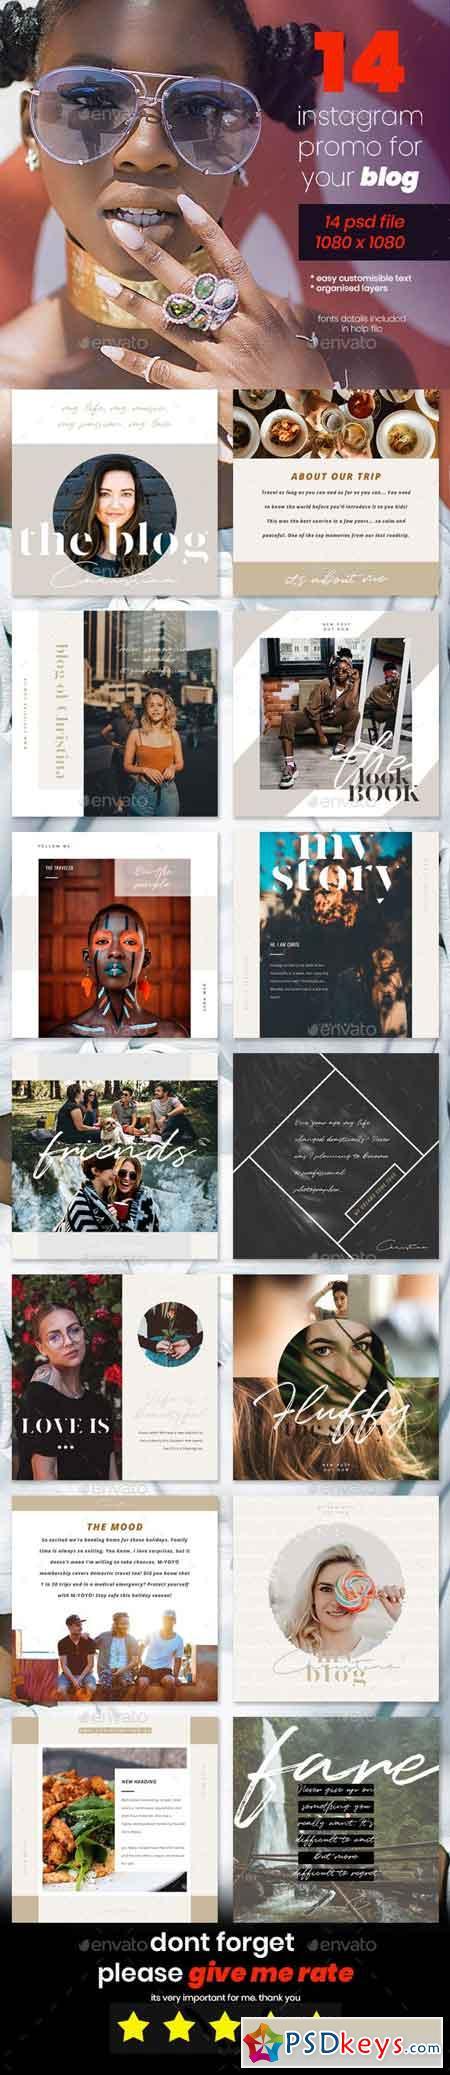 Instagram Blog Promo Pack 23107431